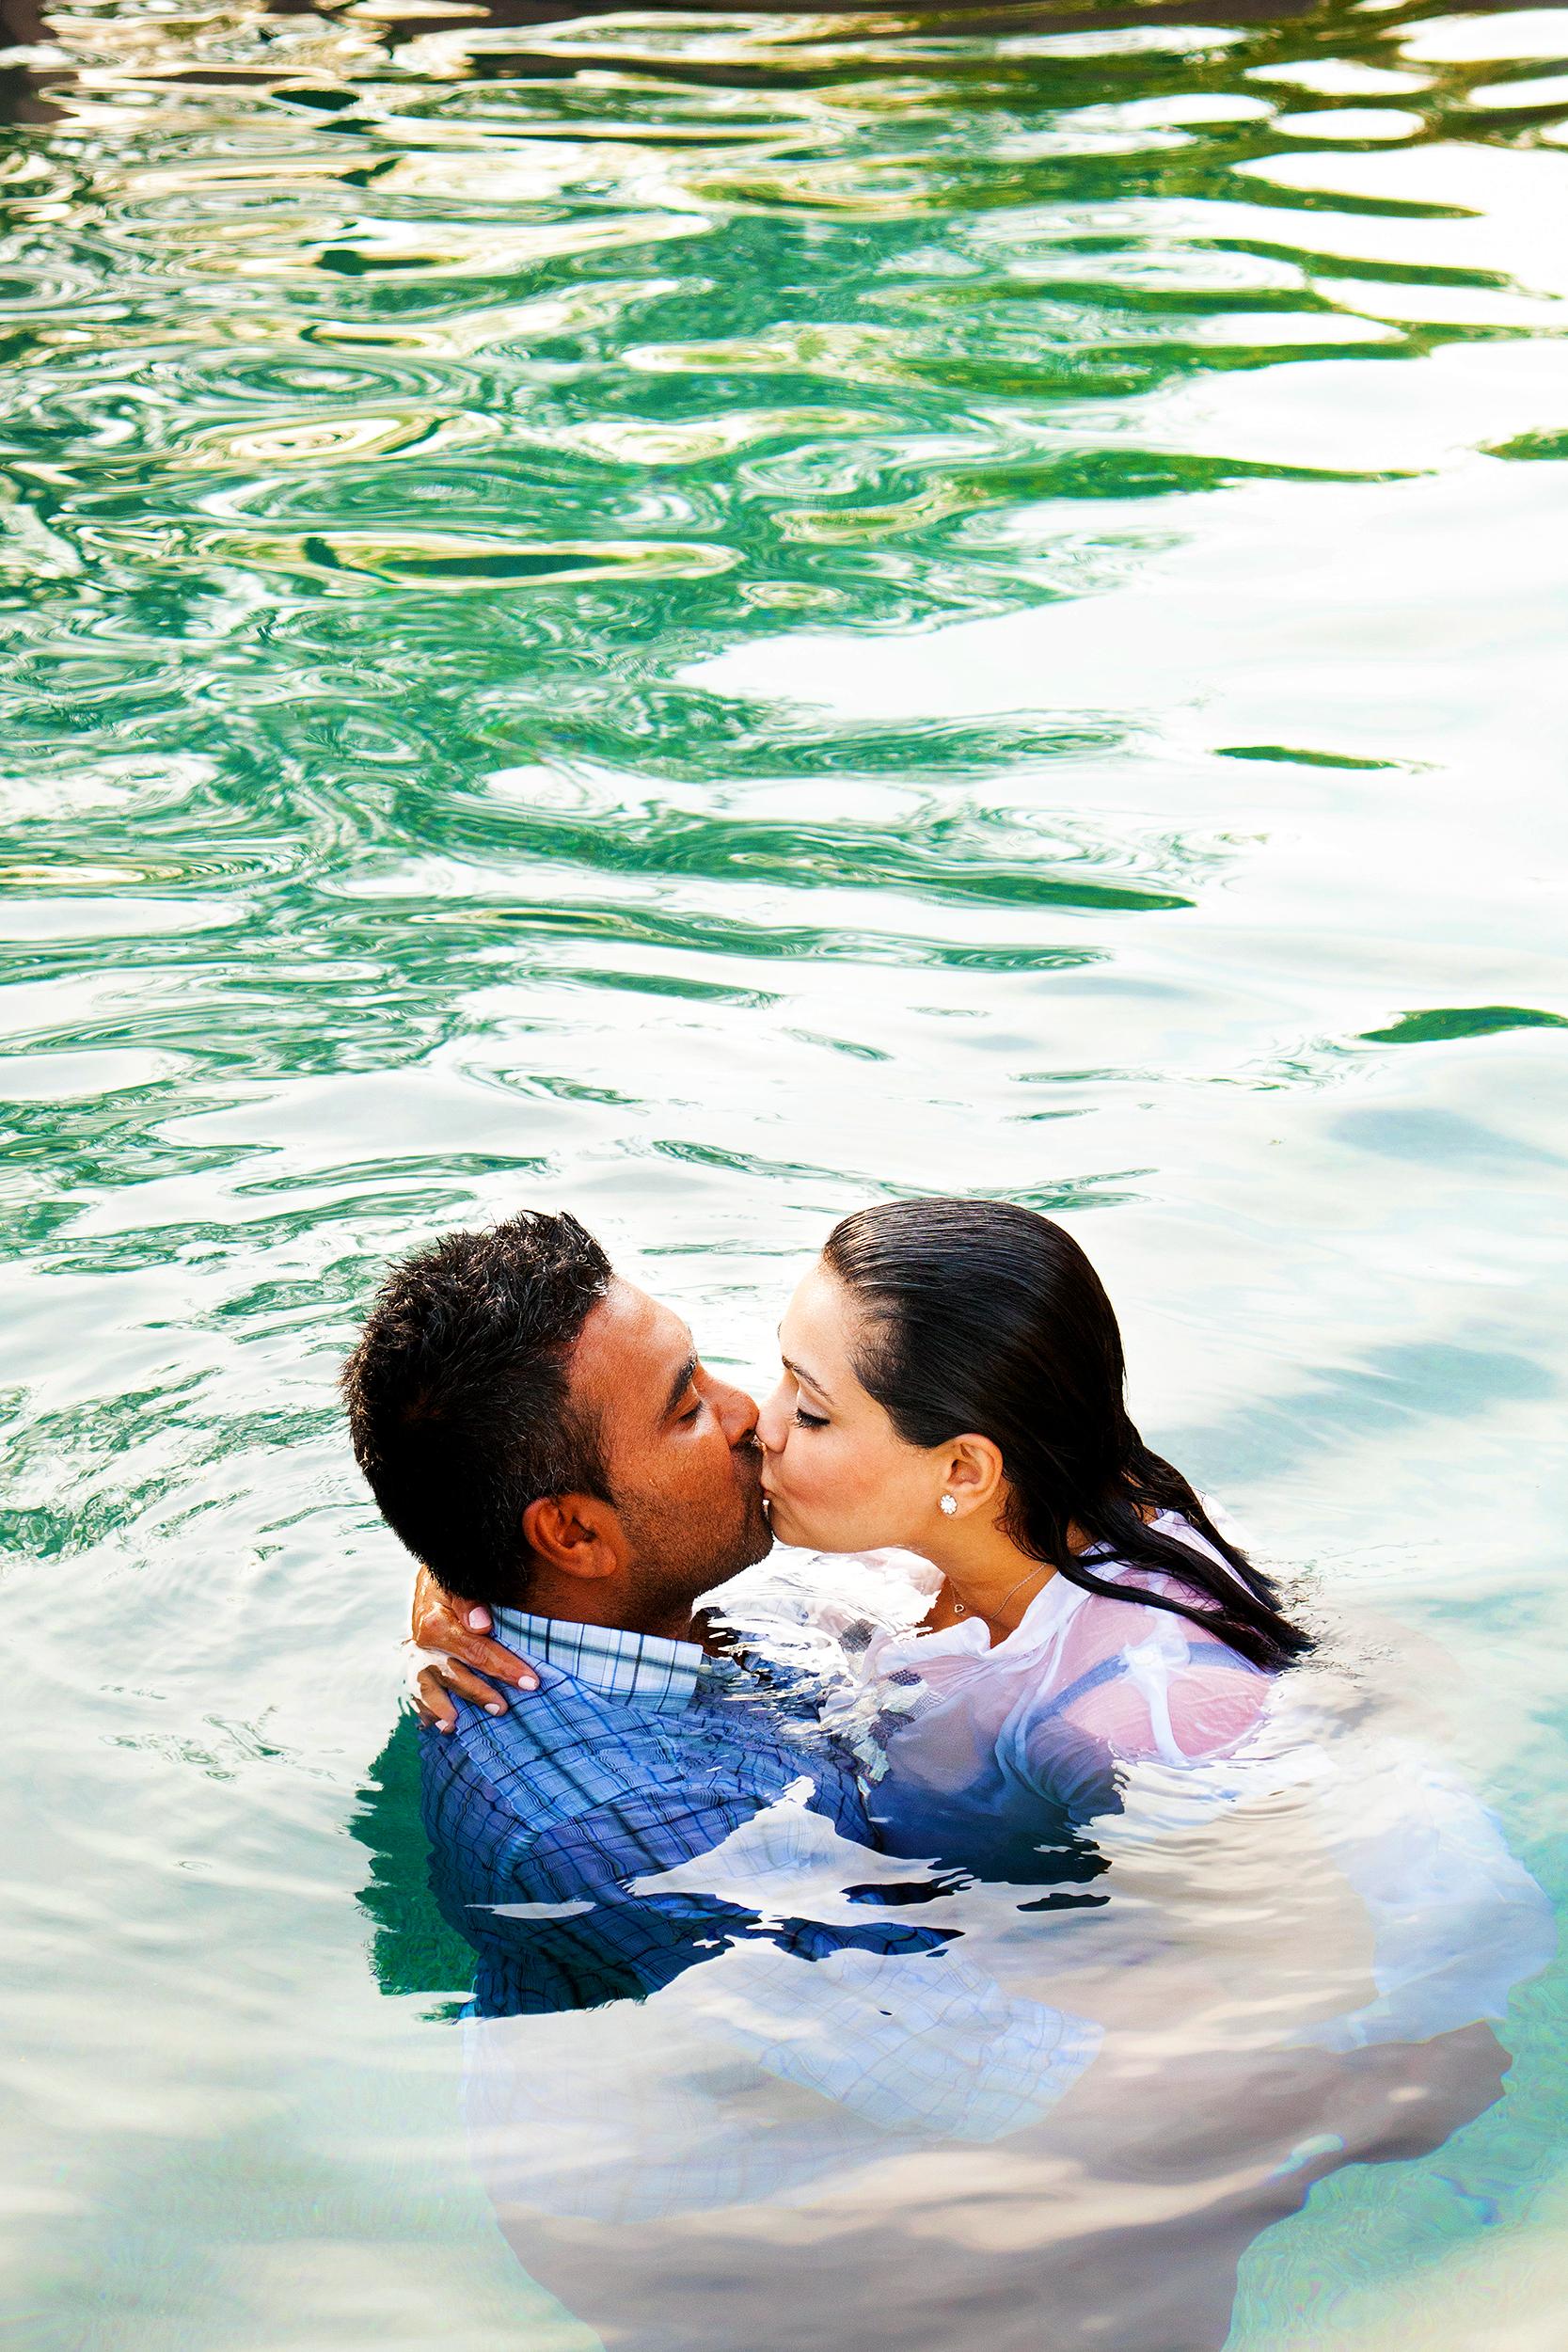 WEB_Couple In Pool_Shah-086.jpg